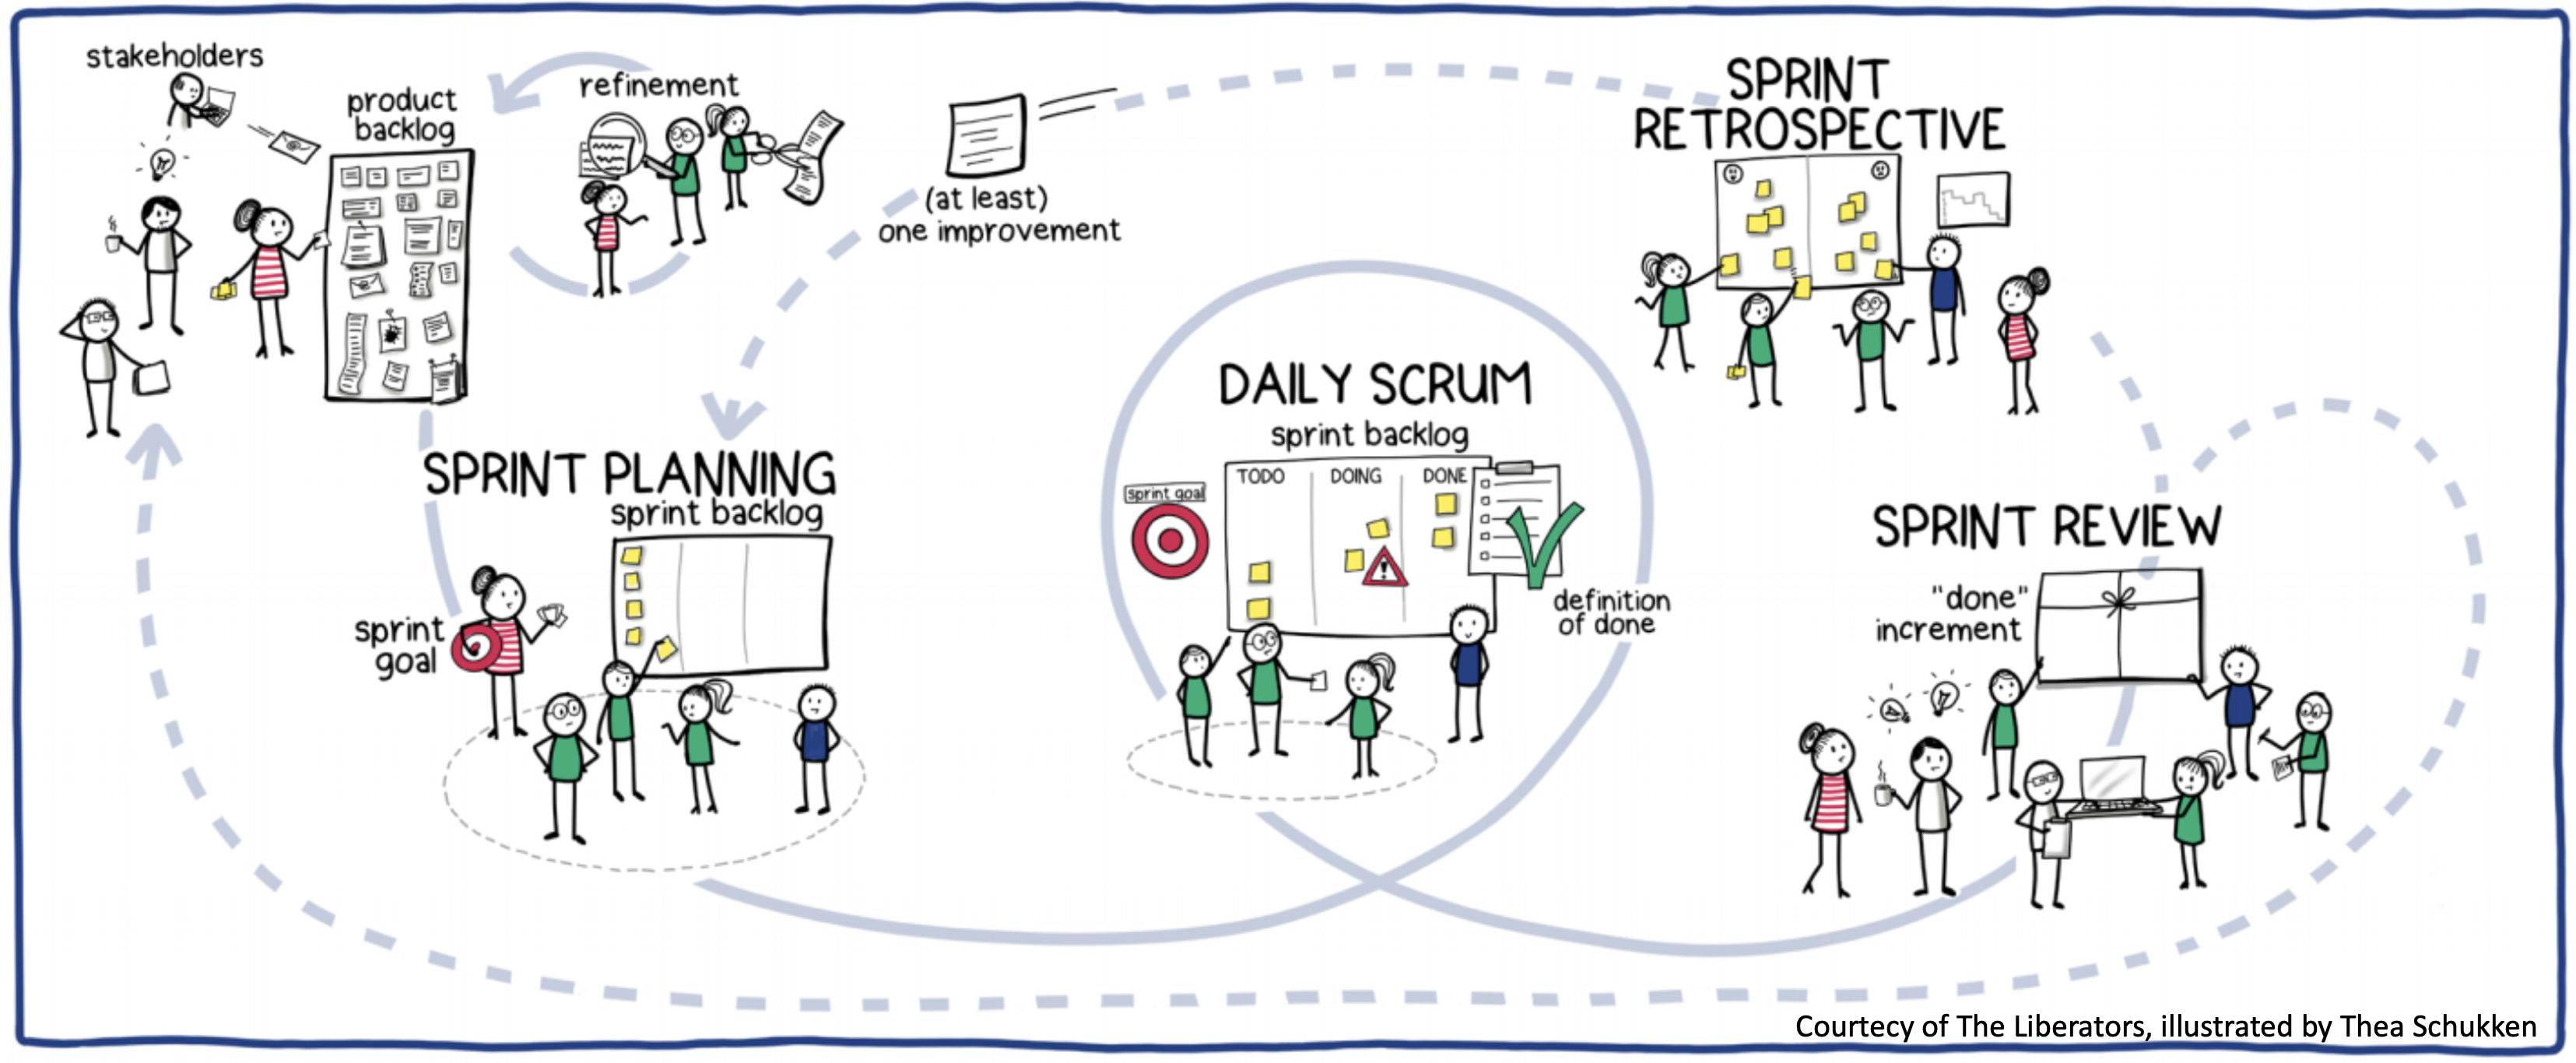 The Scrum Framework illustrated